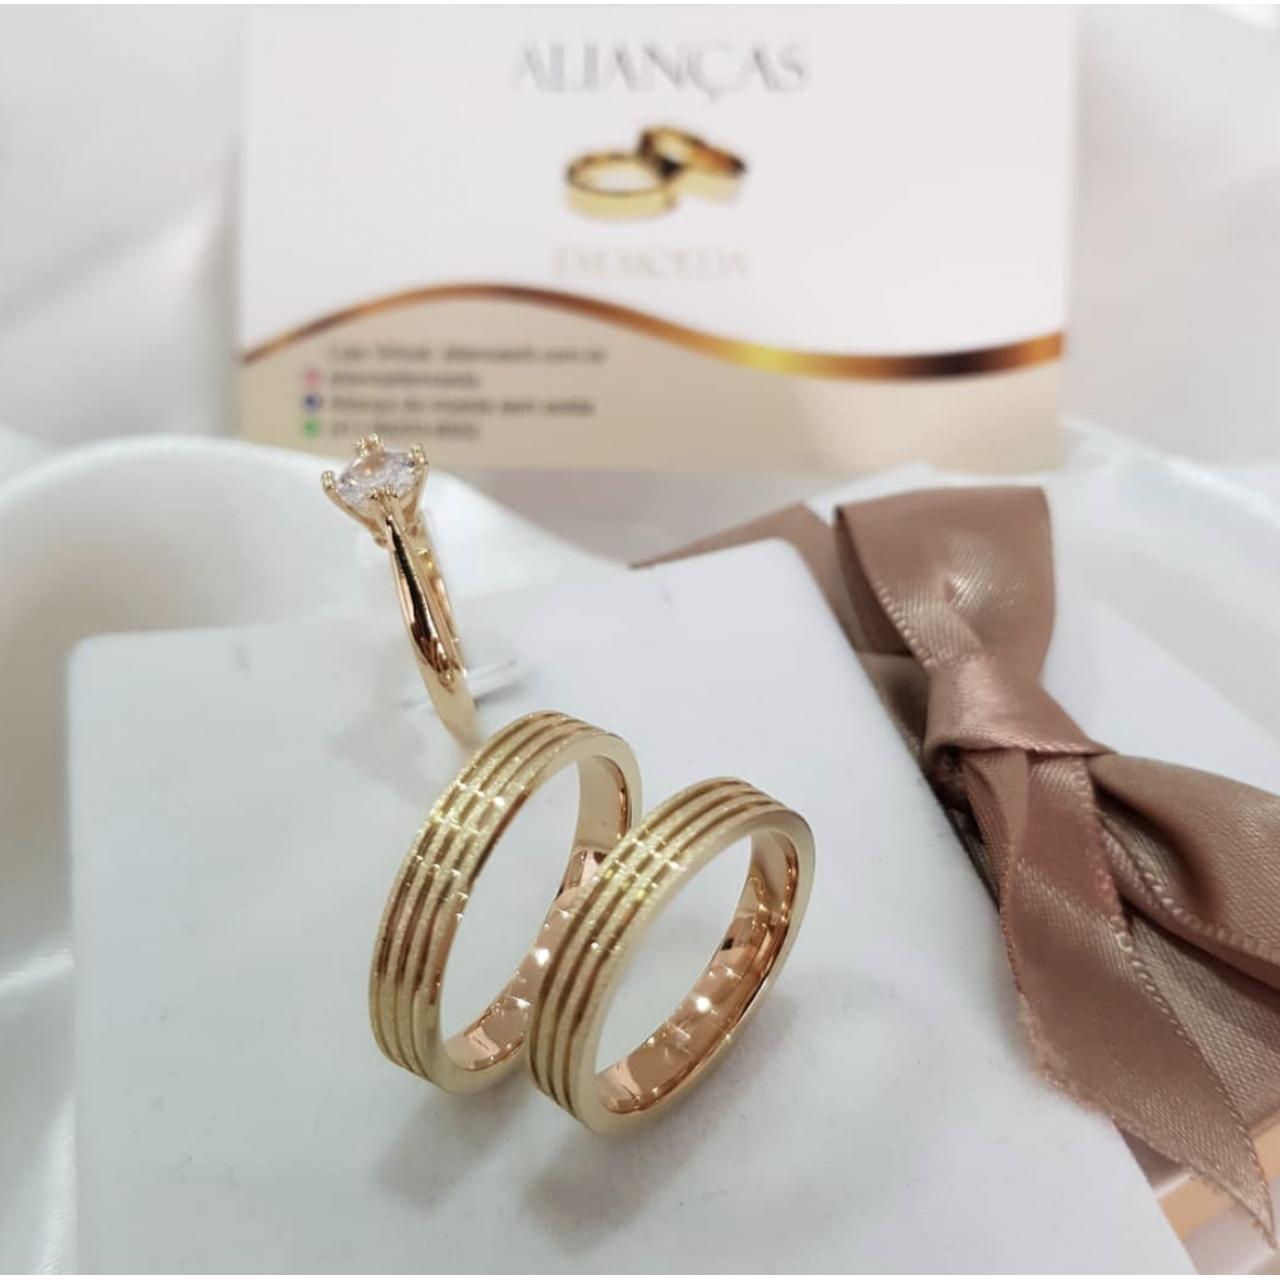 4mm frisos diamantados + anel